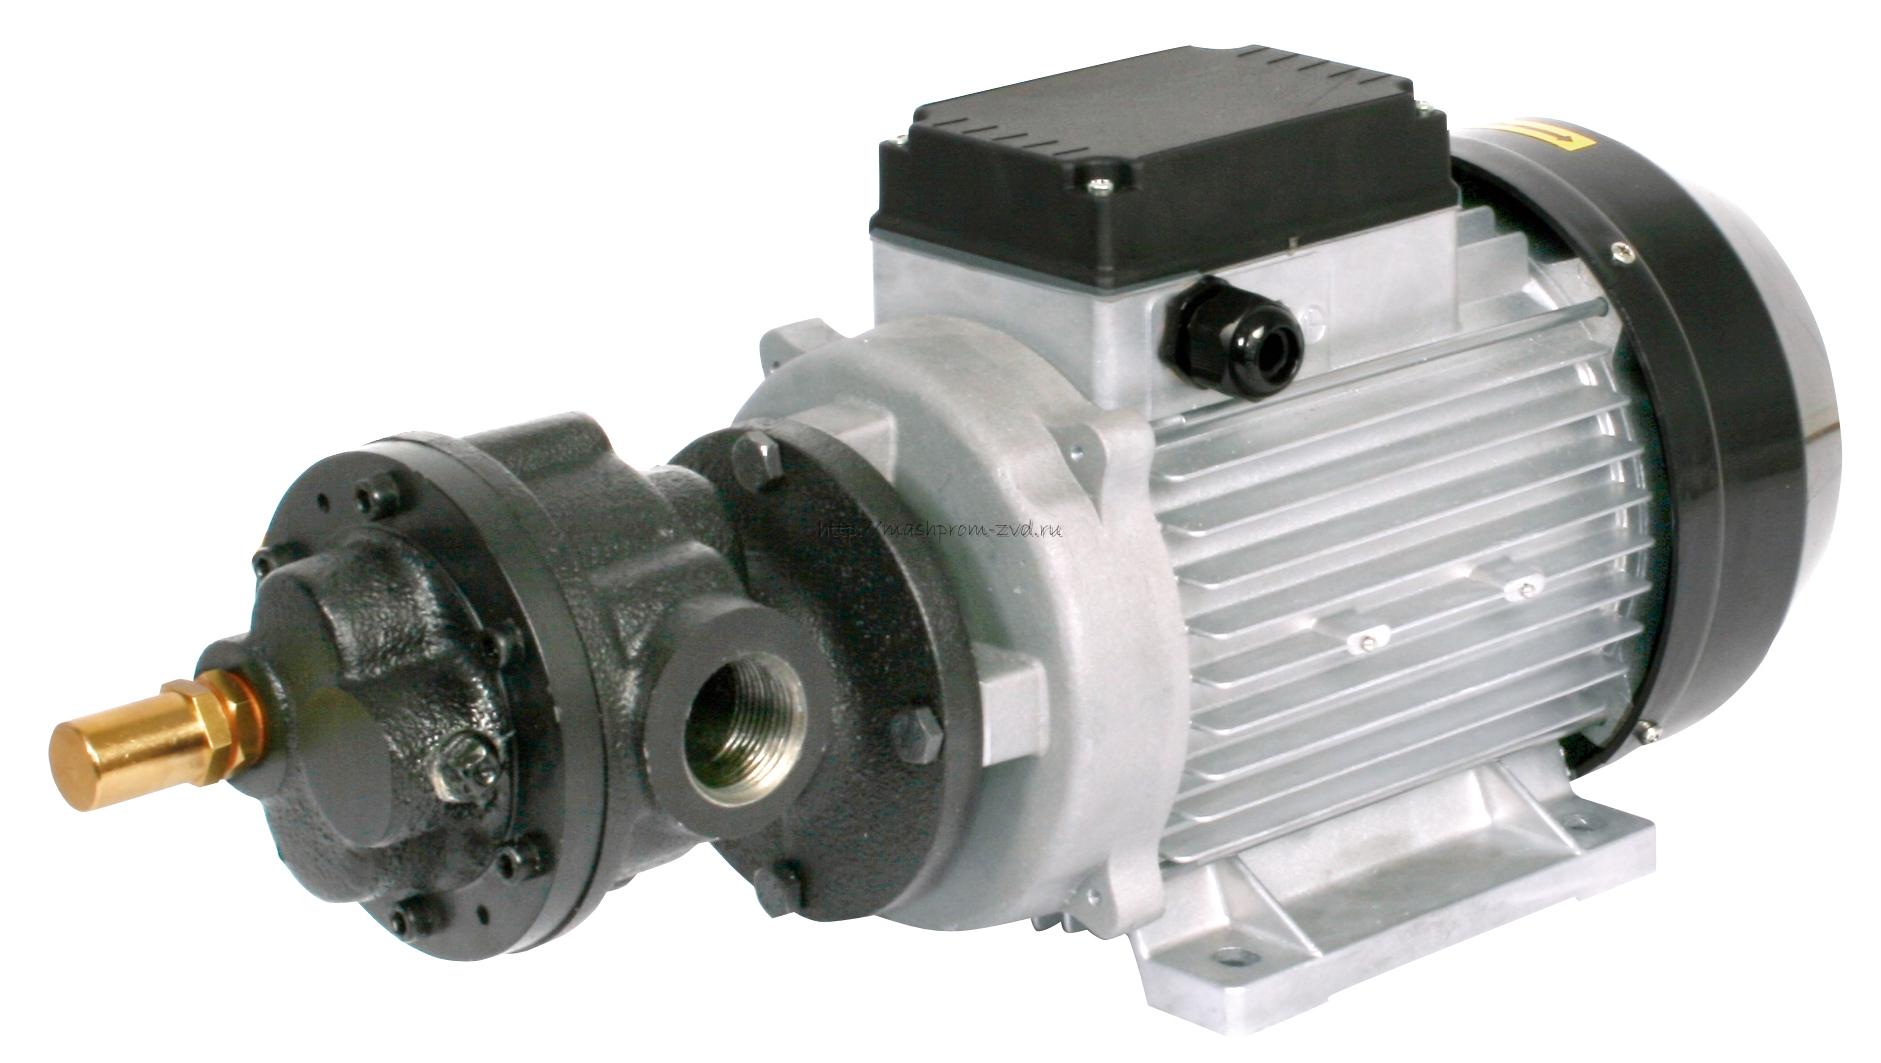 Электрический масляный насос SAMOA арт.561614, 230 V - 50 Hz, 50 л / мин